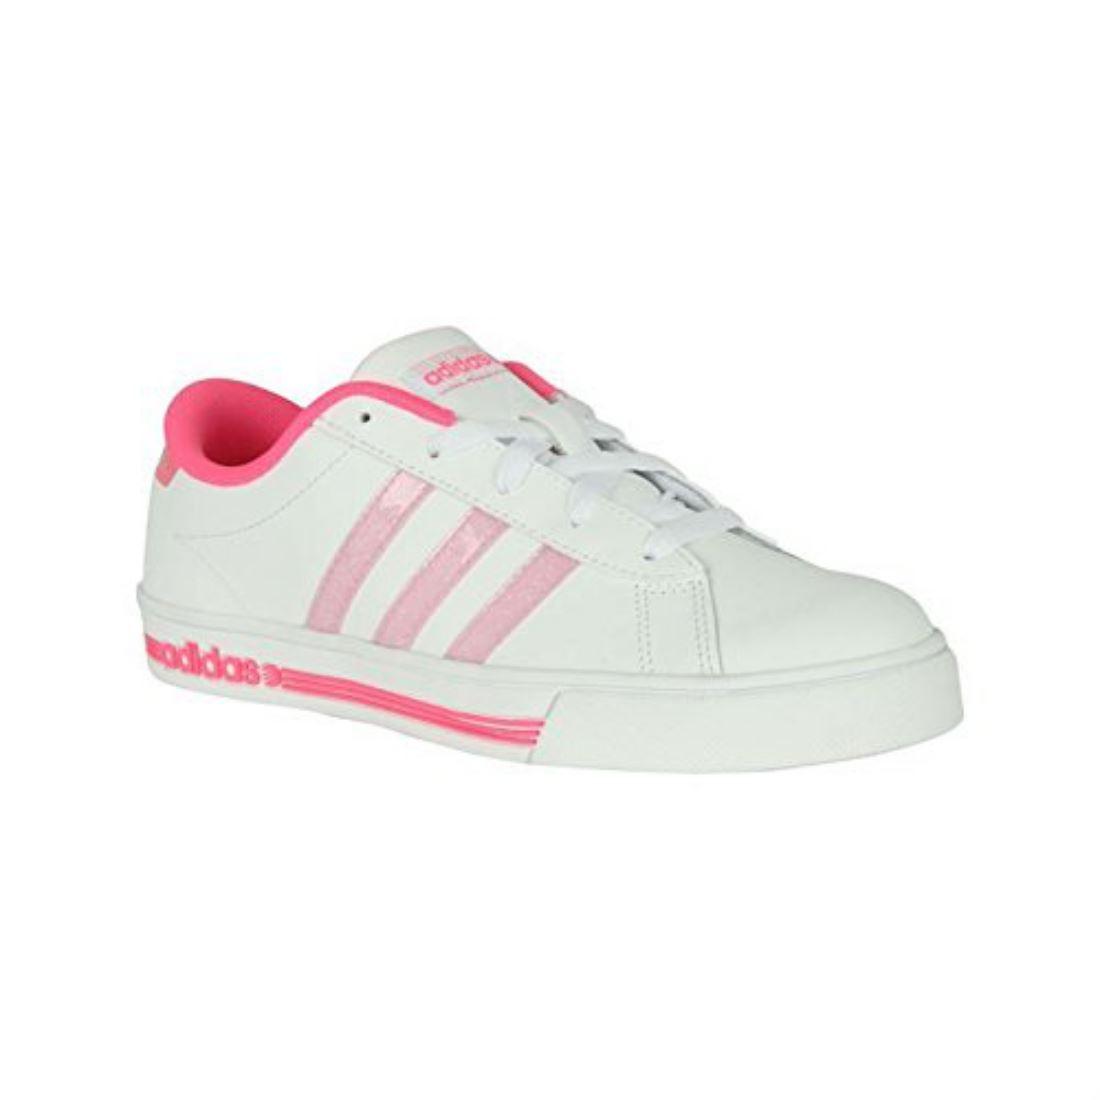 Mua giày Adidas neo tại cửa hàng AdidasSavico Mall